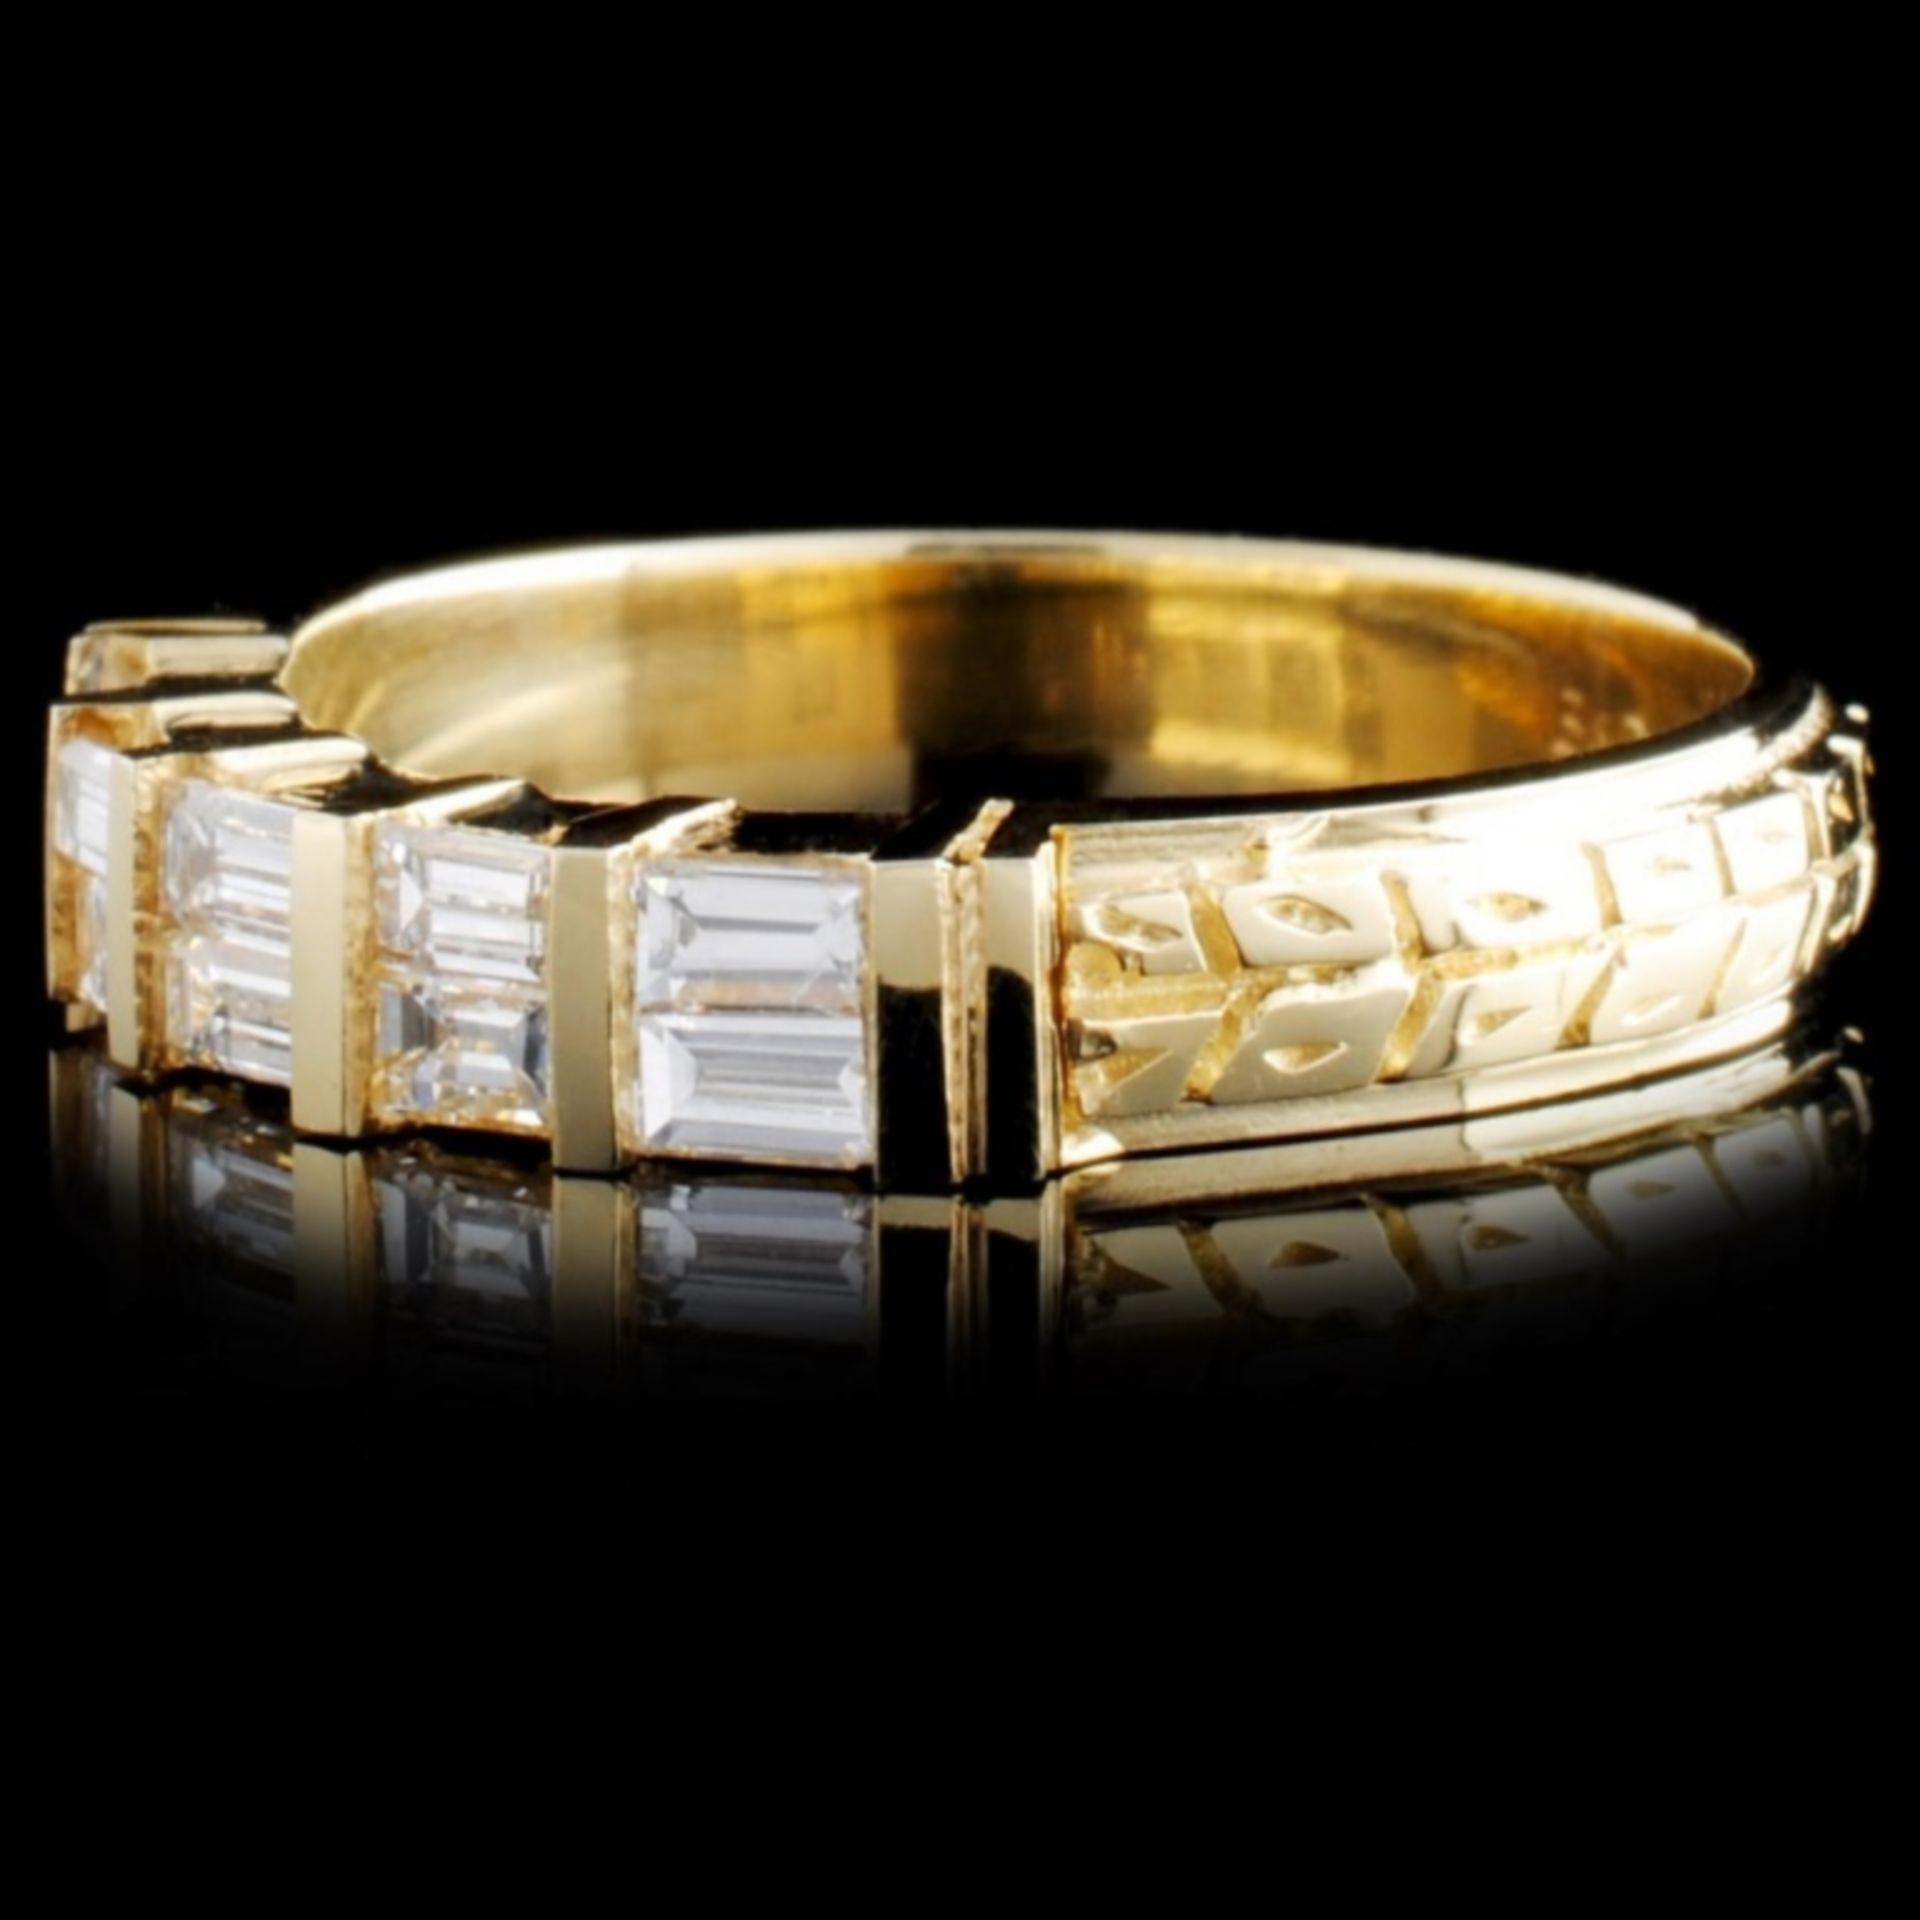 14K Gold 0.62ctw Diamond Ring - Image 2 of 2